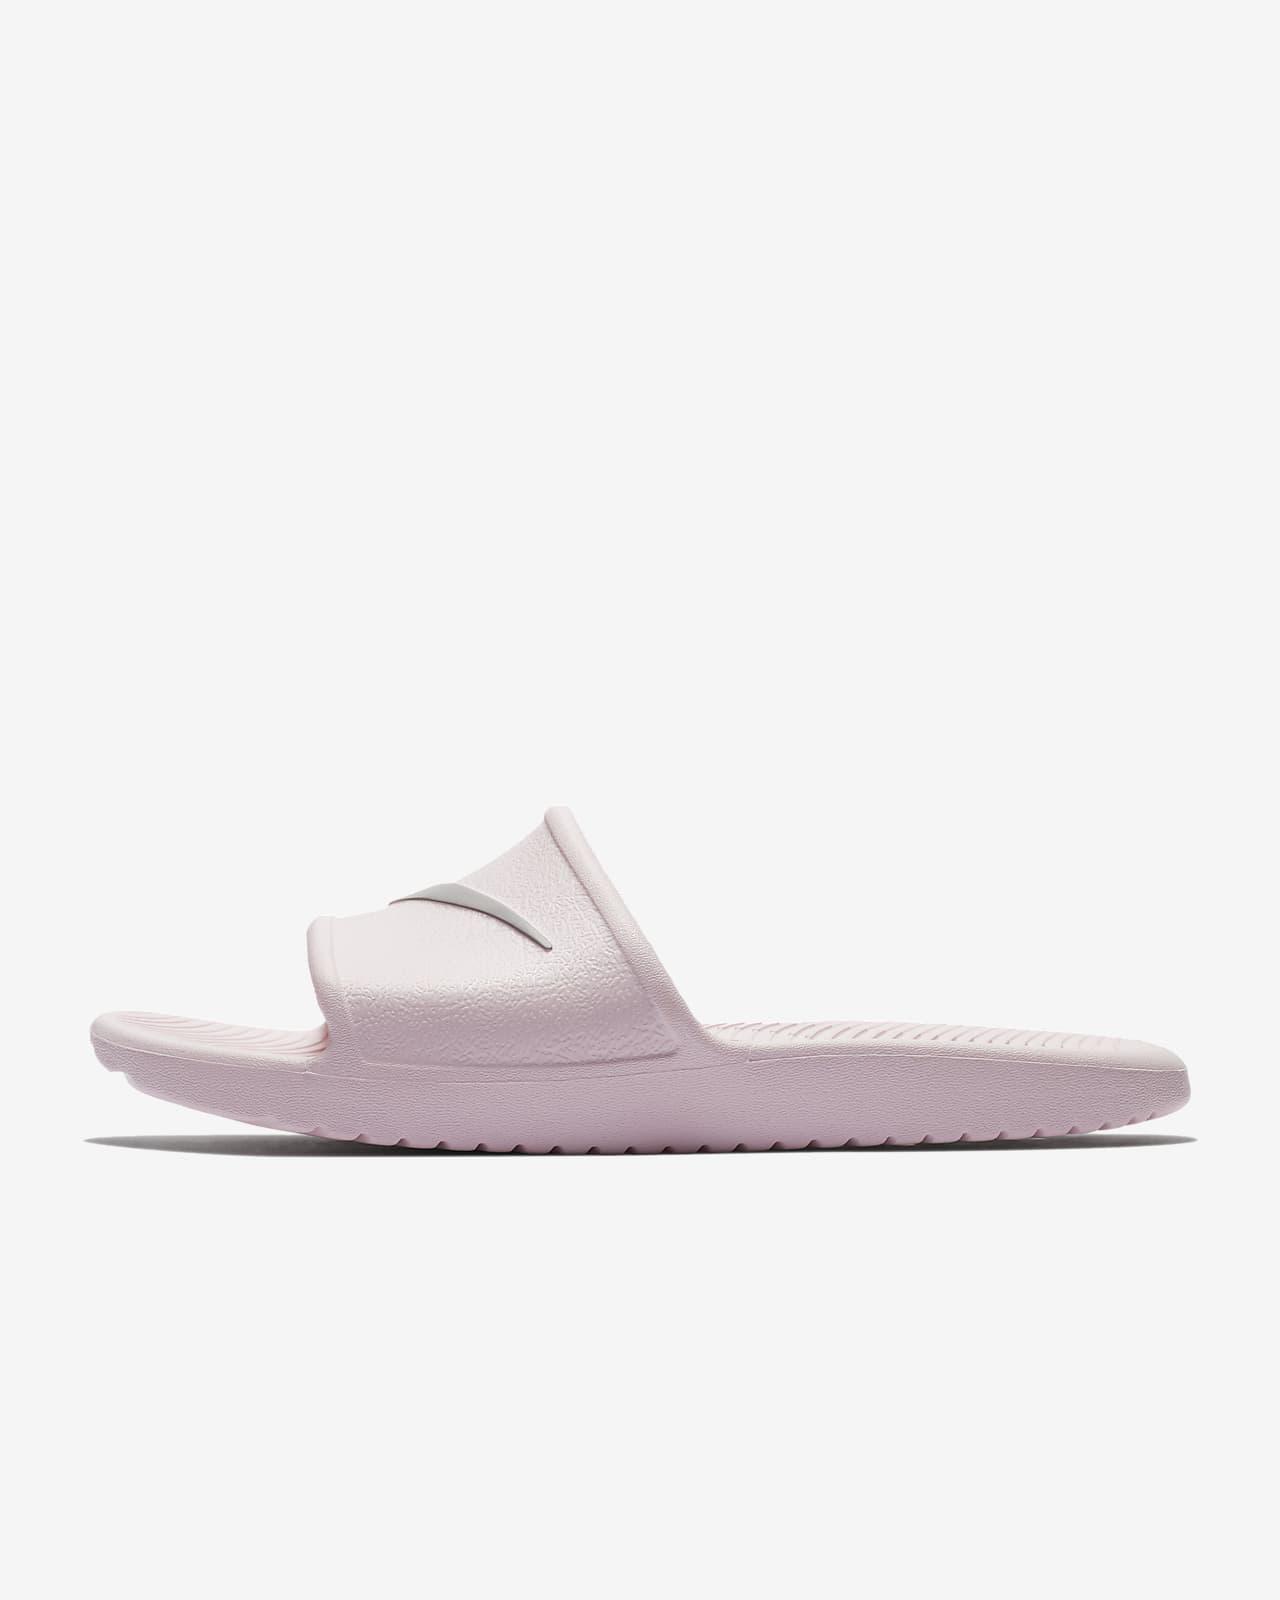 Nike Kawa Women's Slide. Nike SG